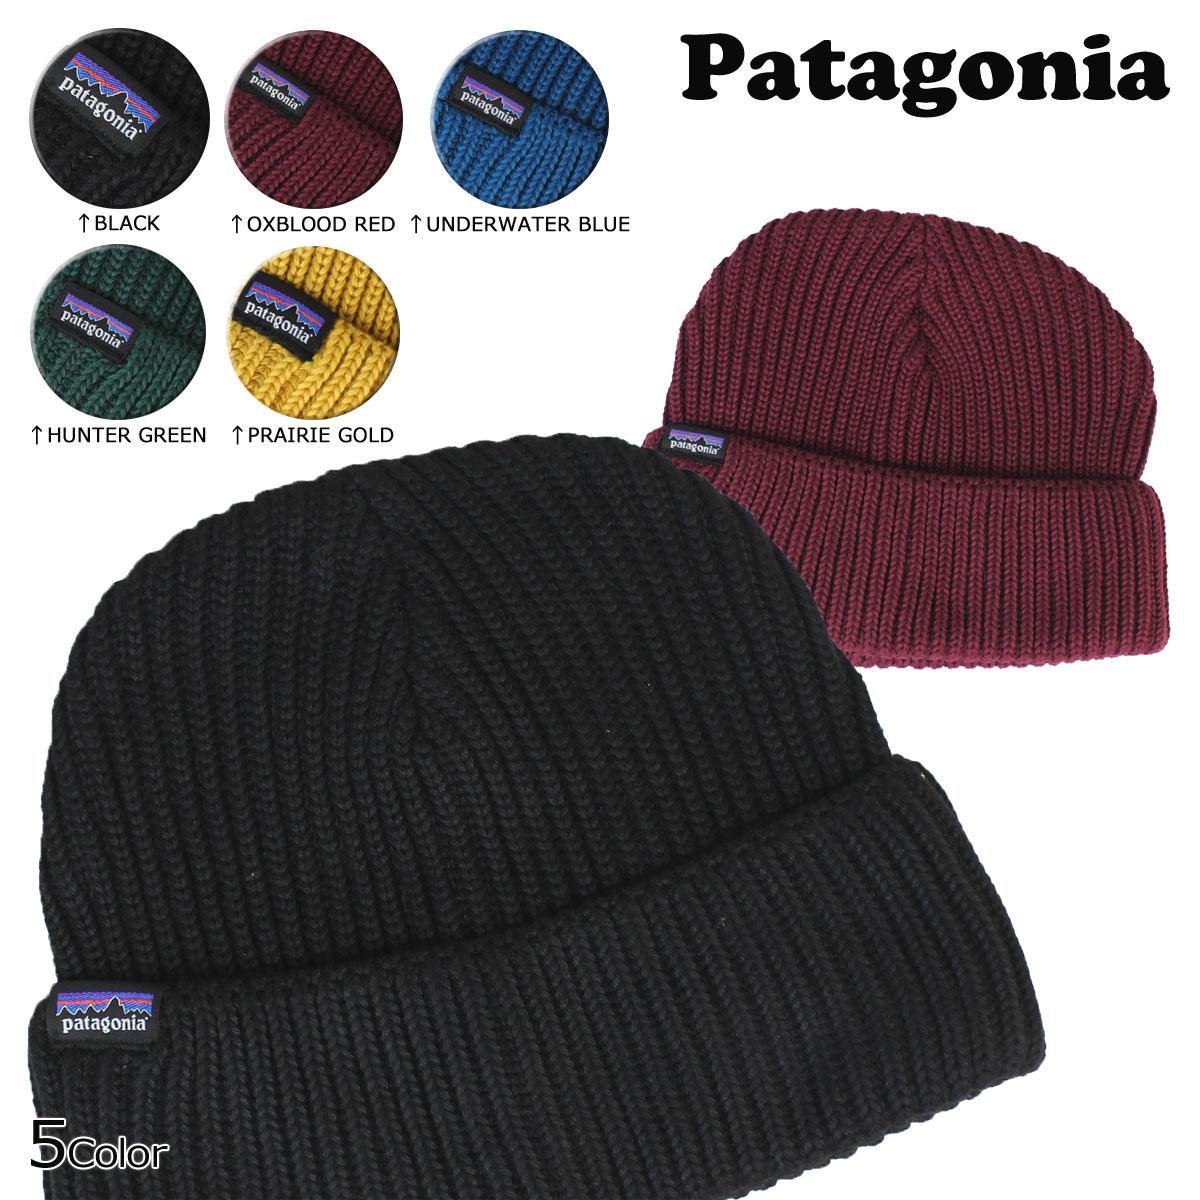 4a1868e93f2 Sugar Online Shop  Patagonia patagonia men s women s knit hat Beanie ...